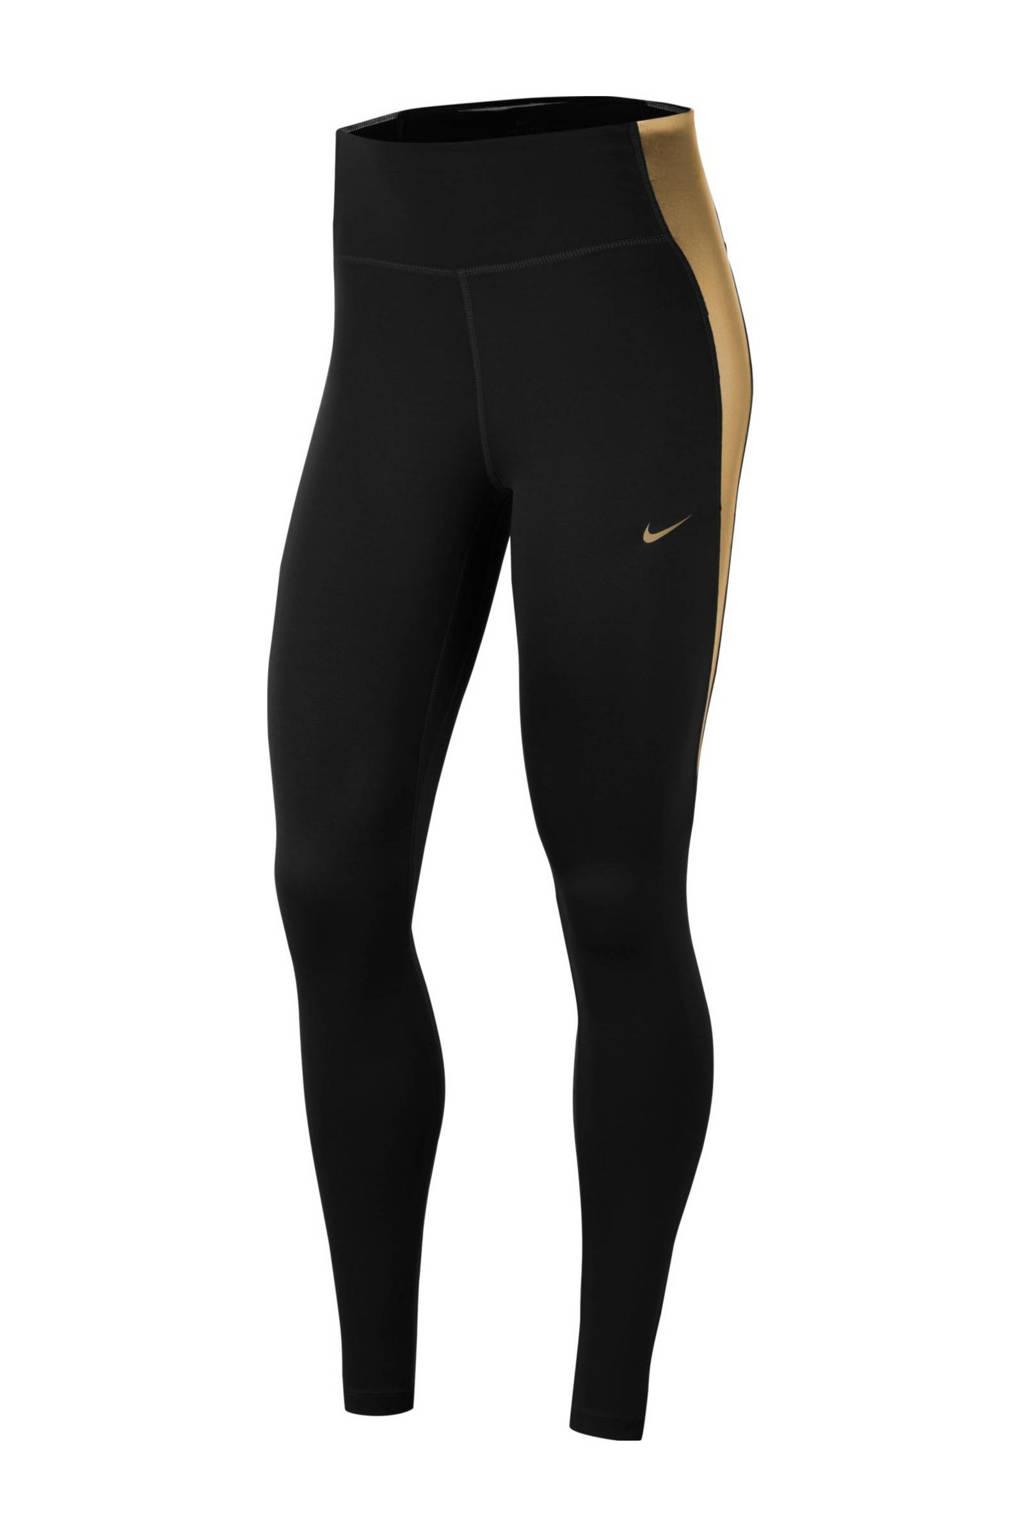 Nike sportbroek zwart/goud, Zwart/goud